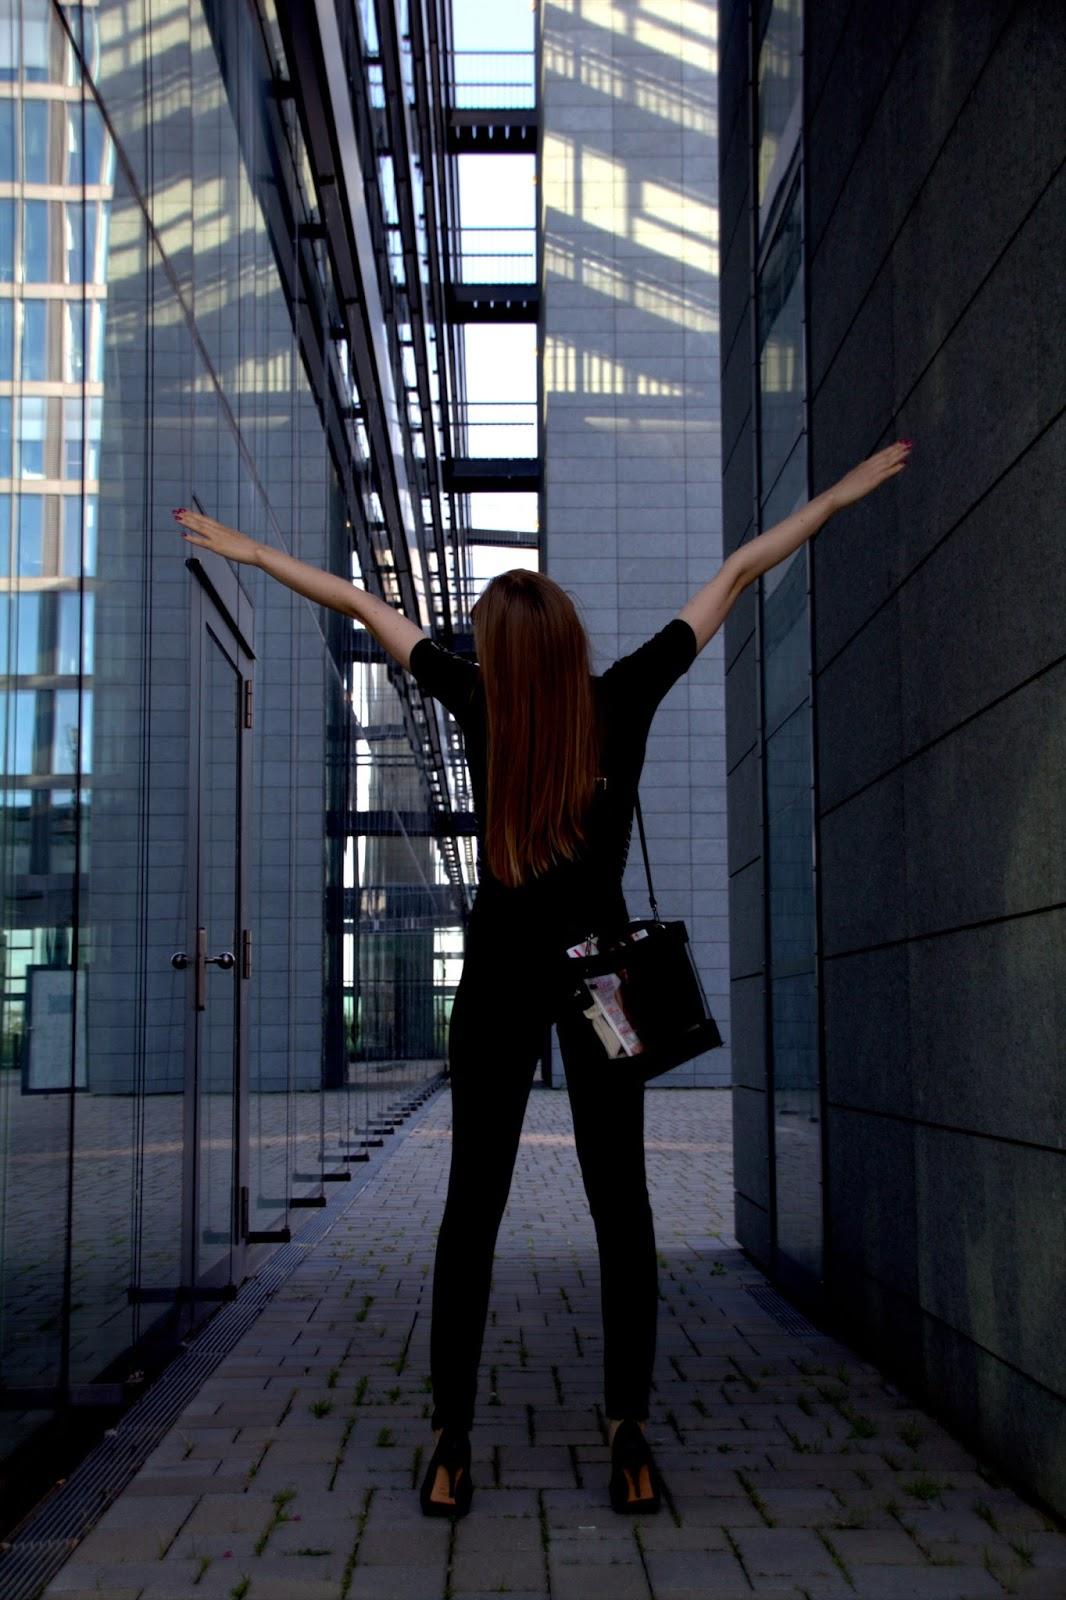 Around office buildings